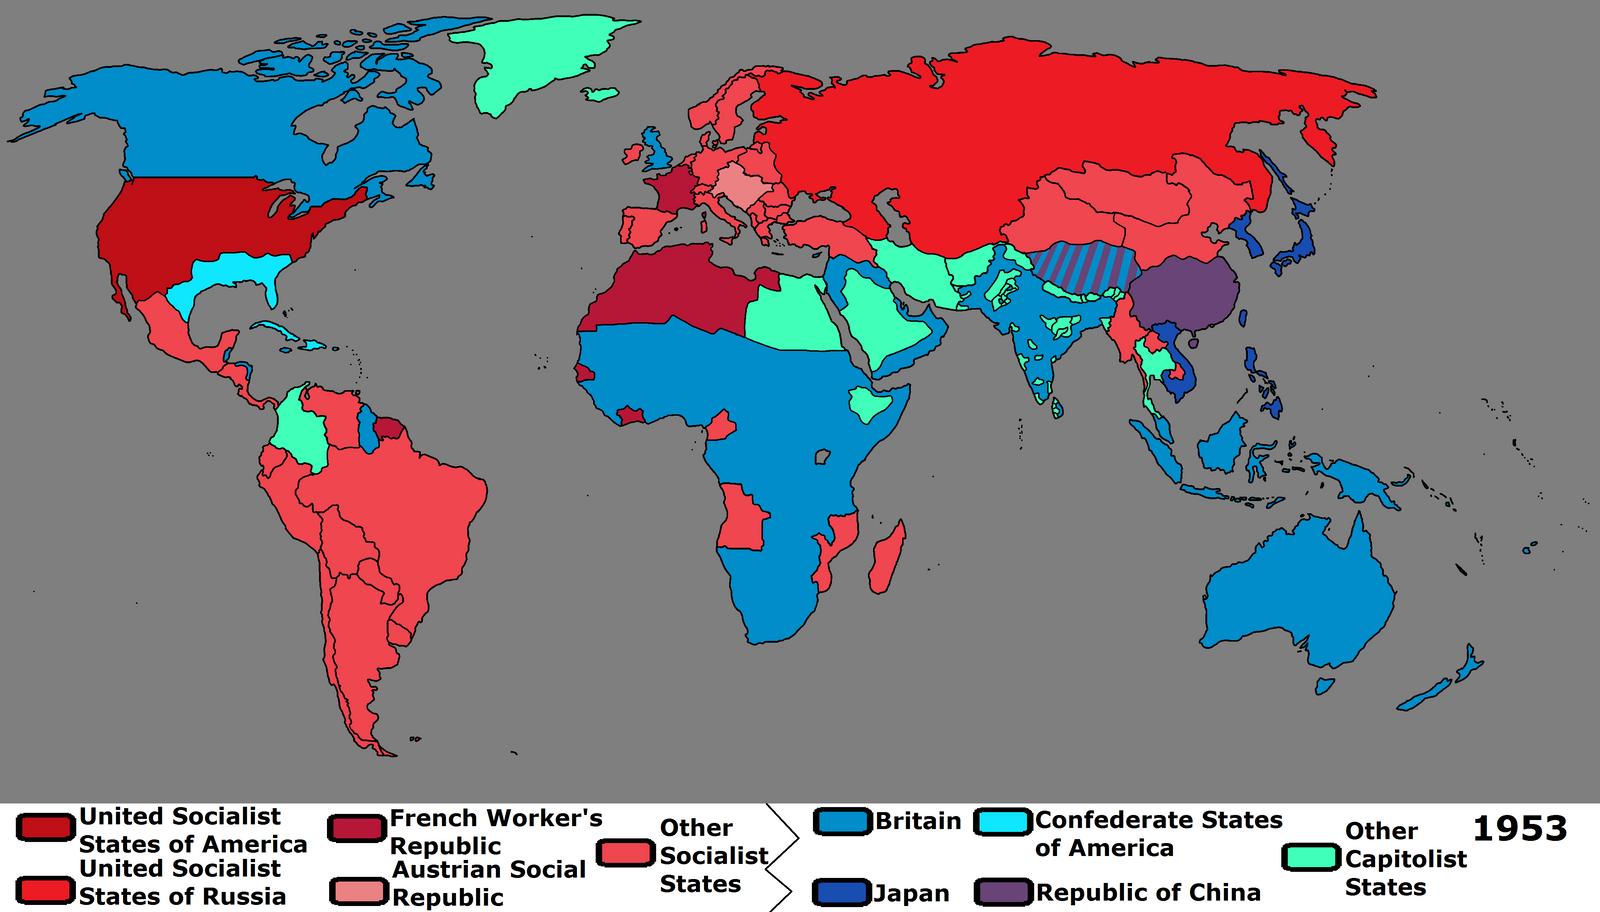 Communism spread in us map